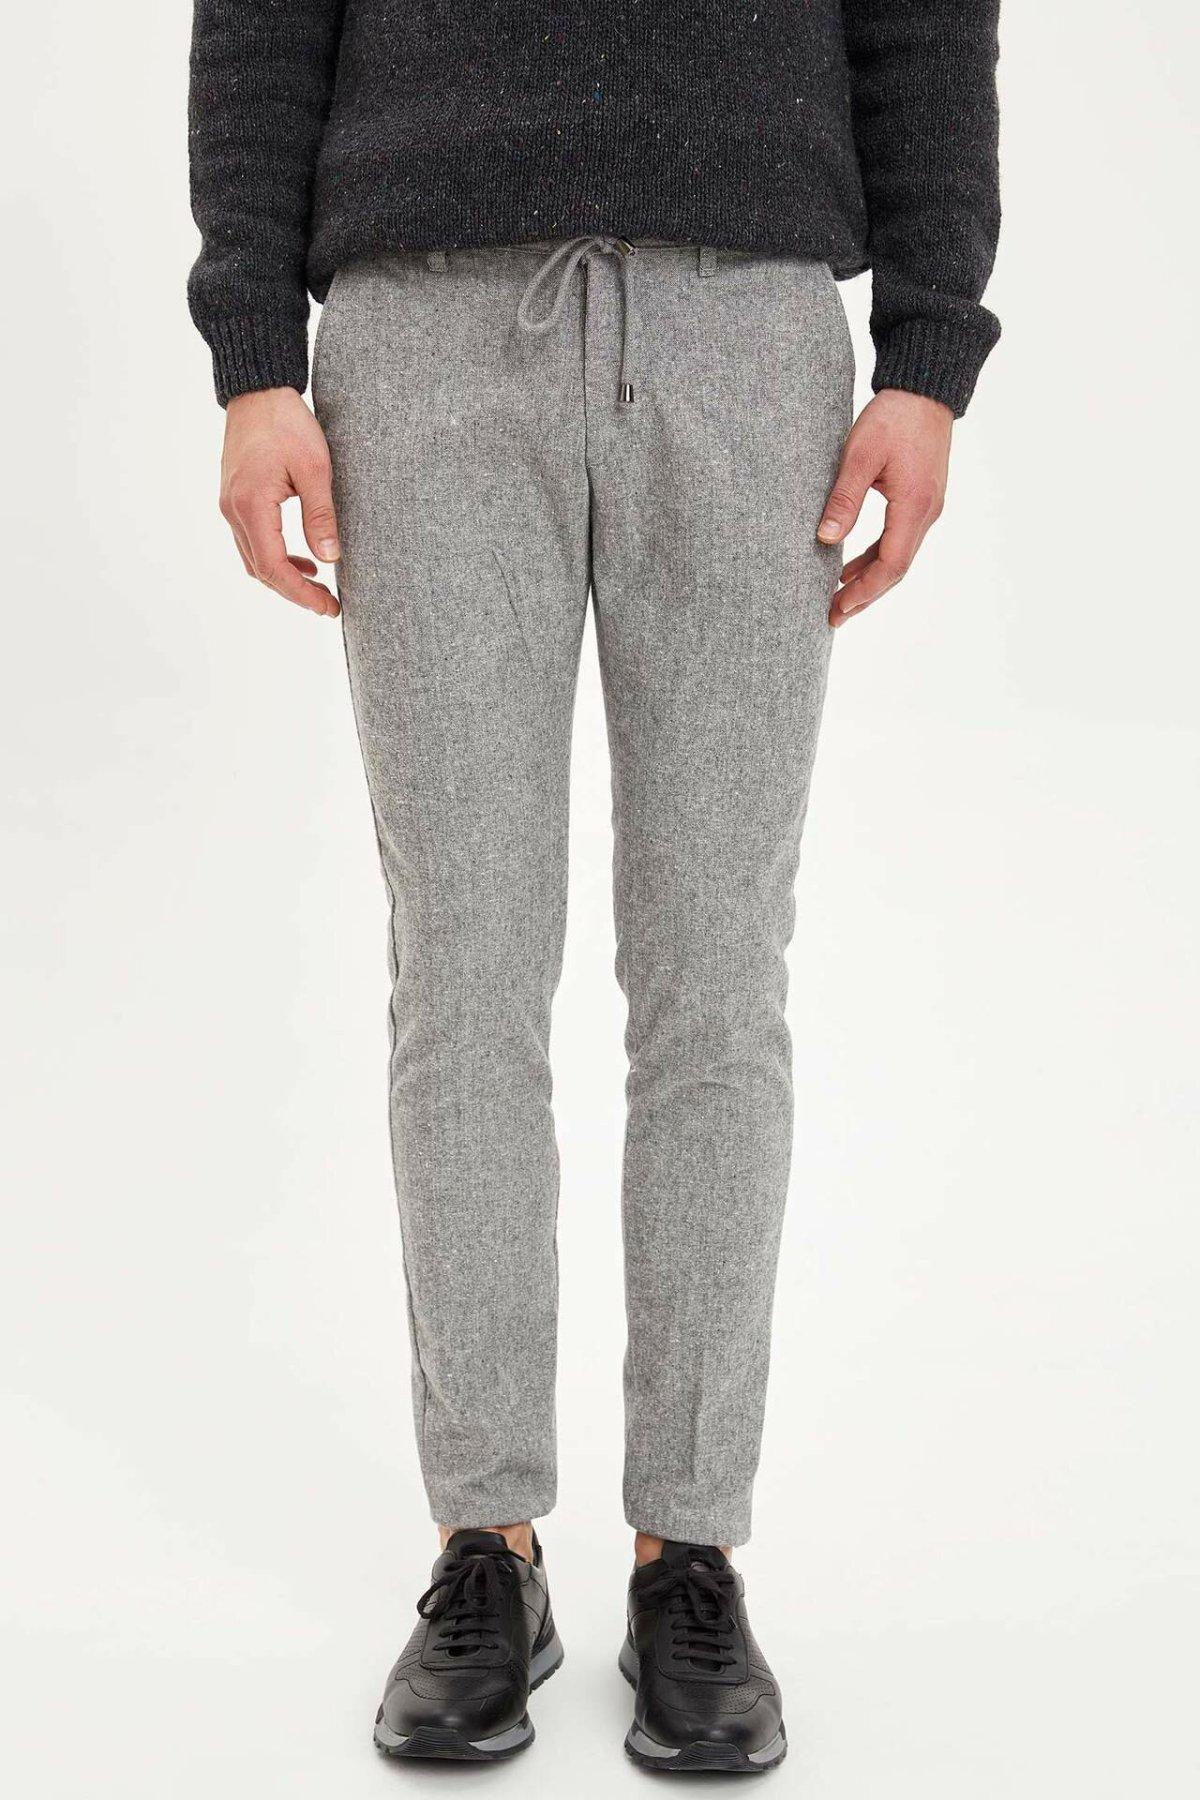 DeFacto Man Winter Light Grey Long Pants Men Casual Lace-up Thick Bottoms Male Mid-waist Trousers-M2100AZ19WN